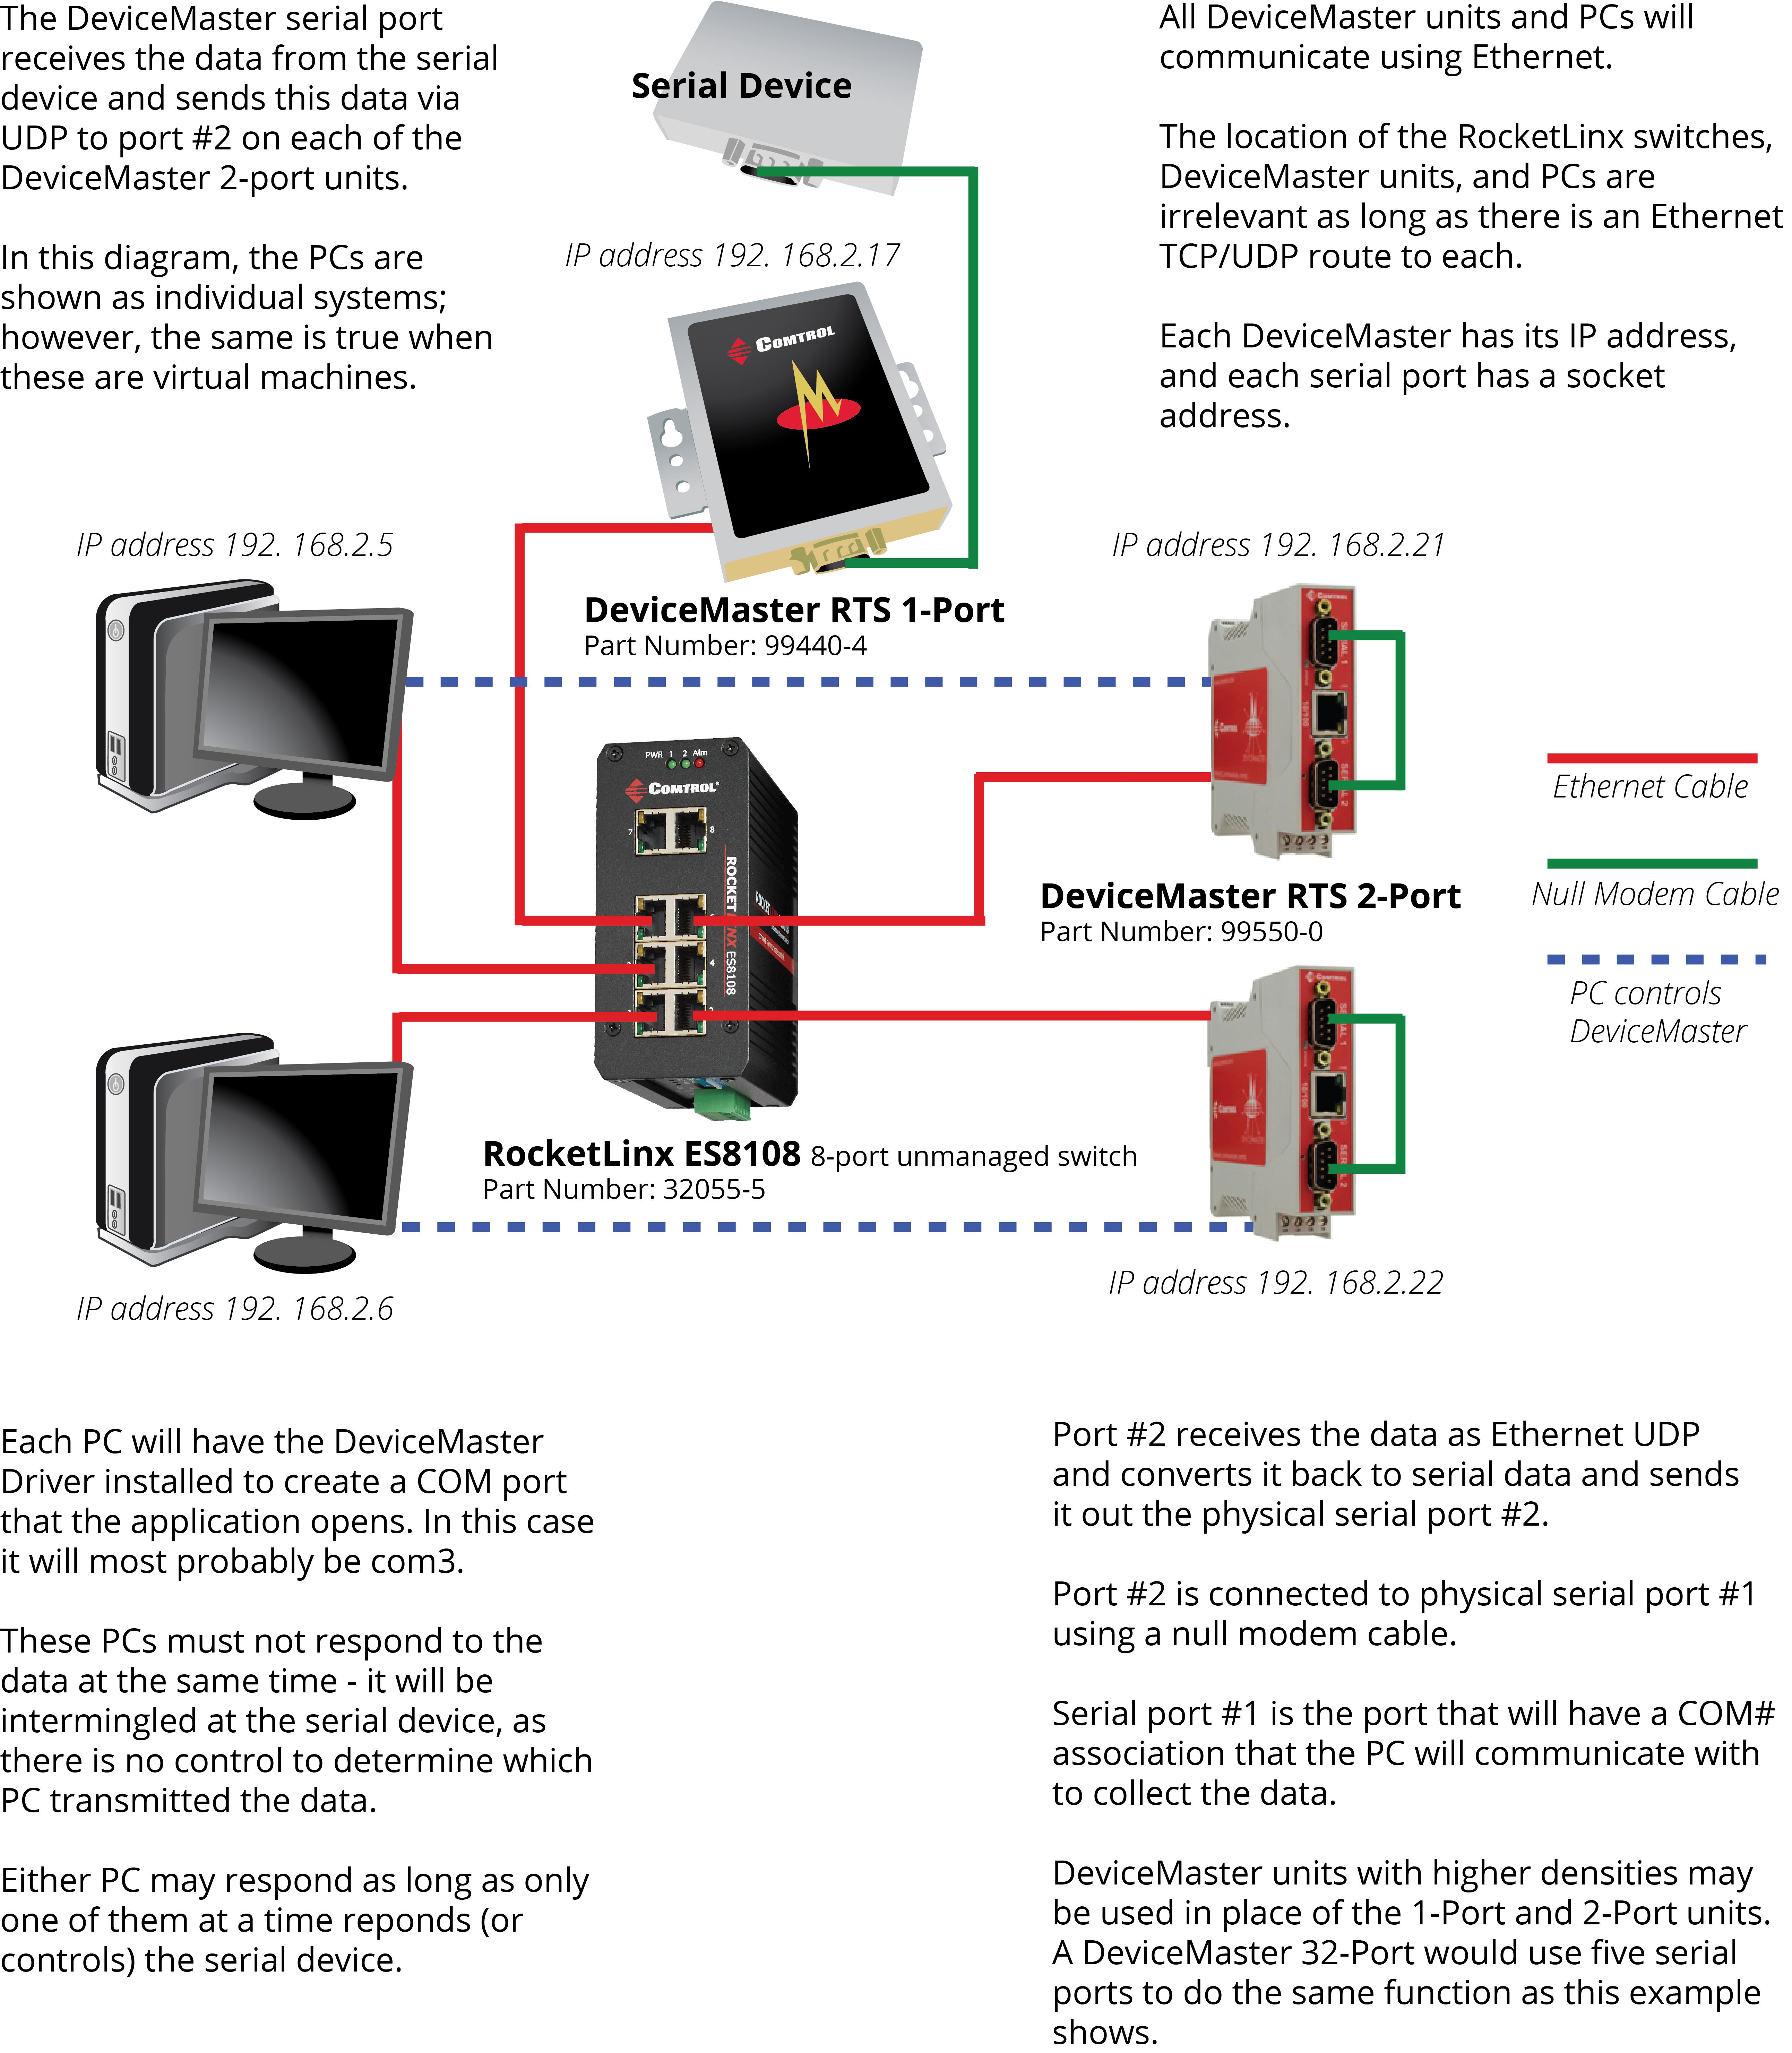 Redundant Serial Device Monitoring